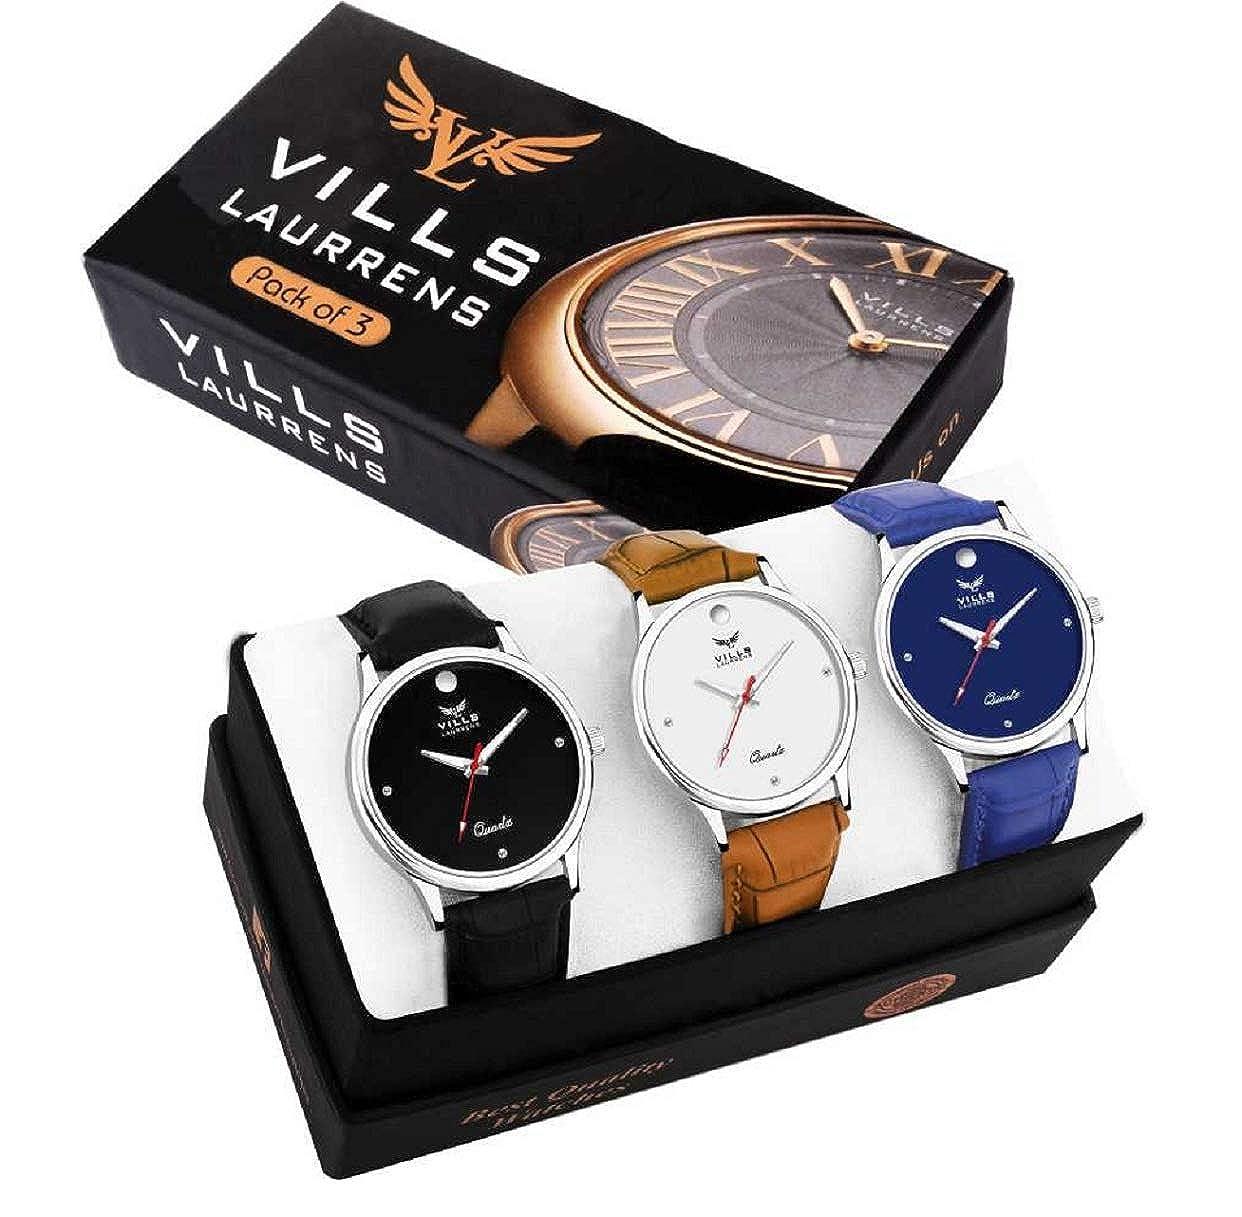 Vills Laurrens VL-1141-1142-1143 Pack of 3 Smart and